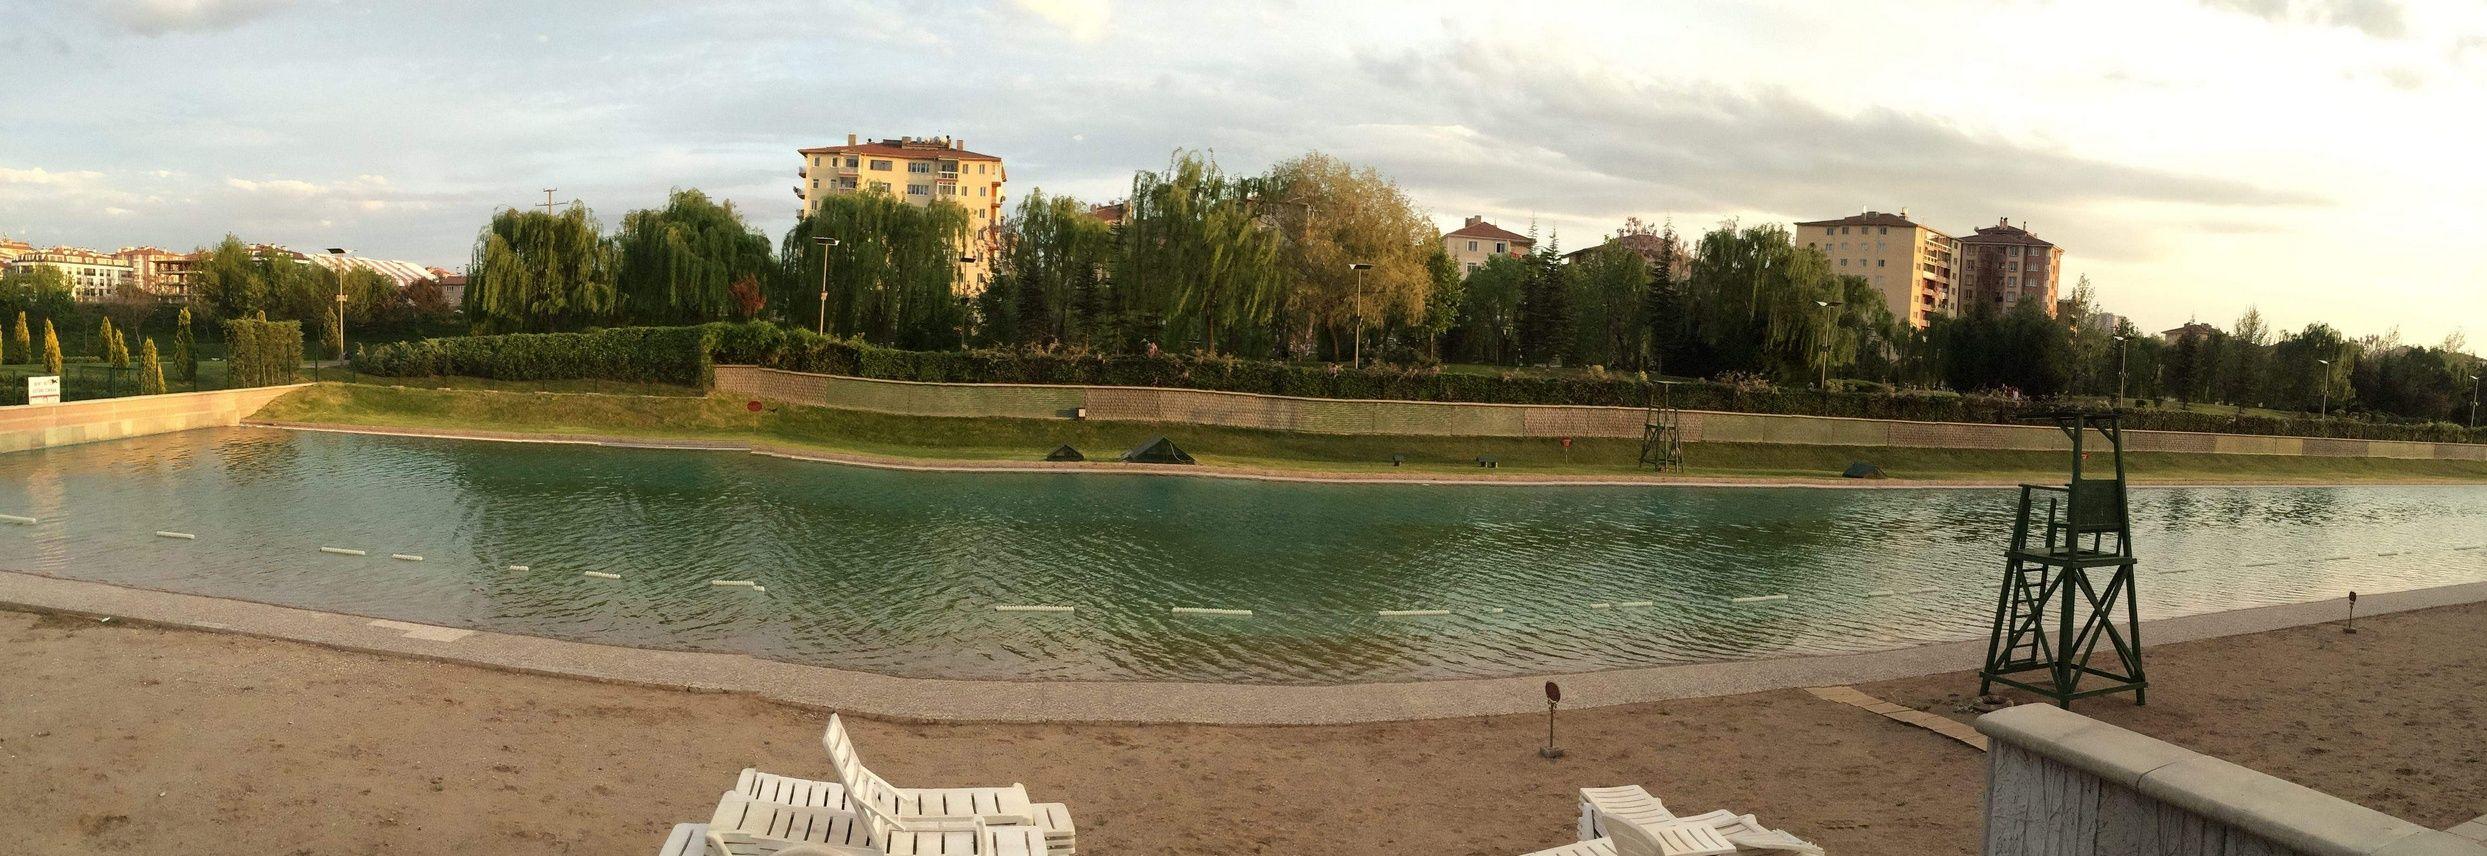 Eskişehir Yapay Göl